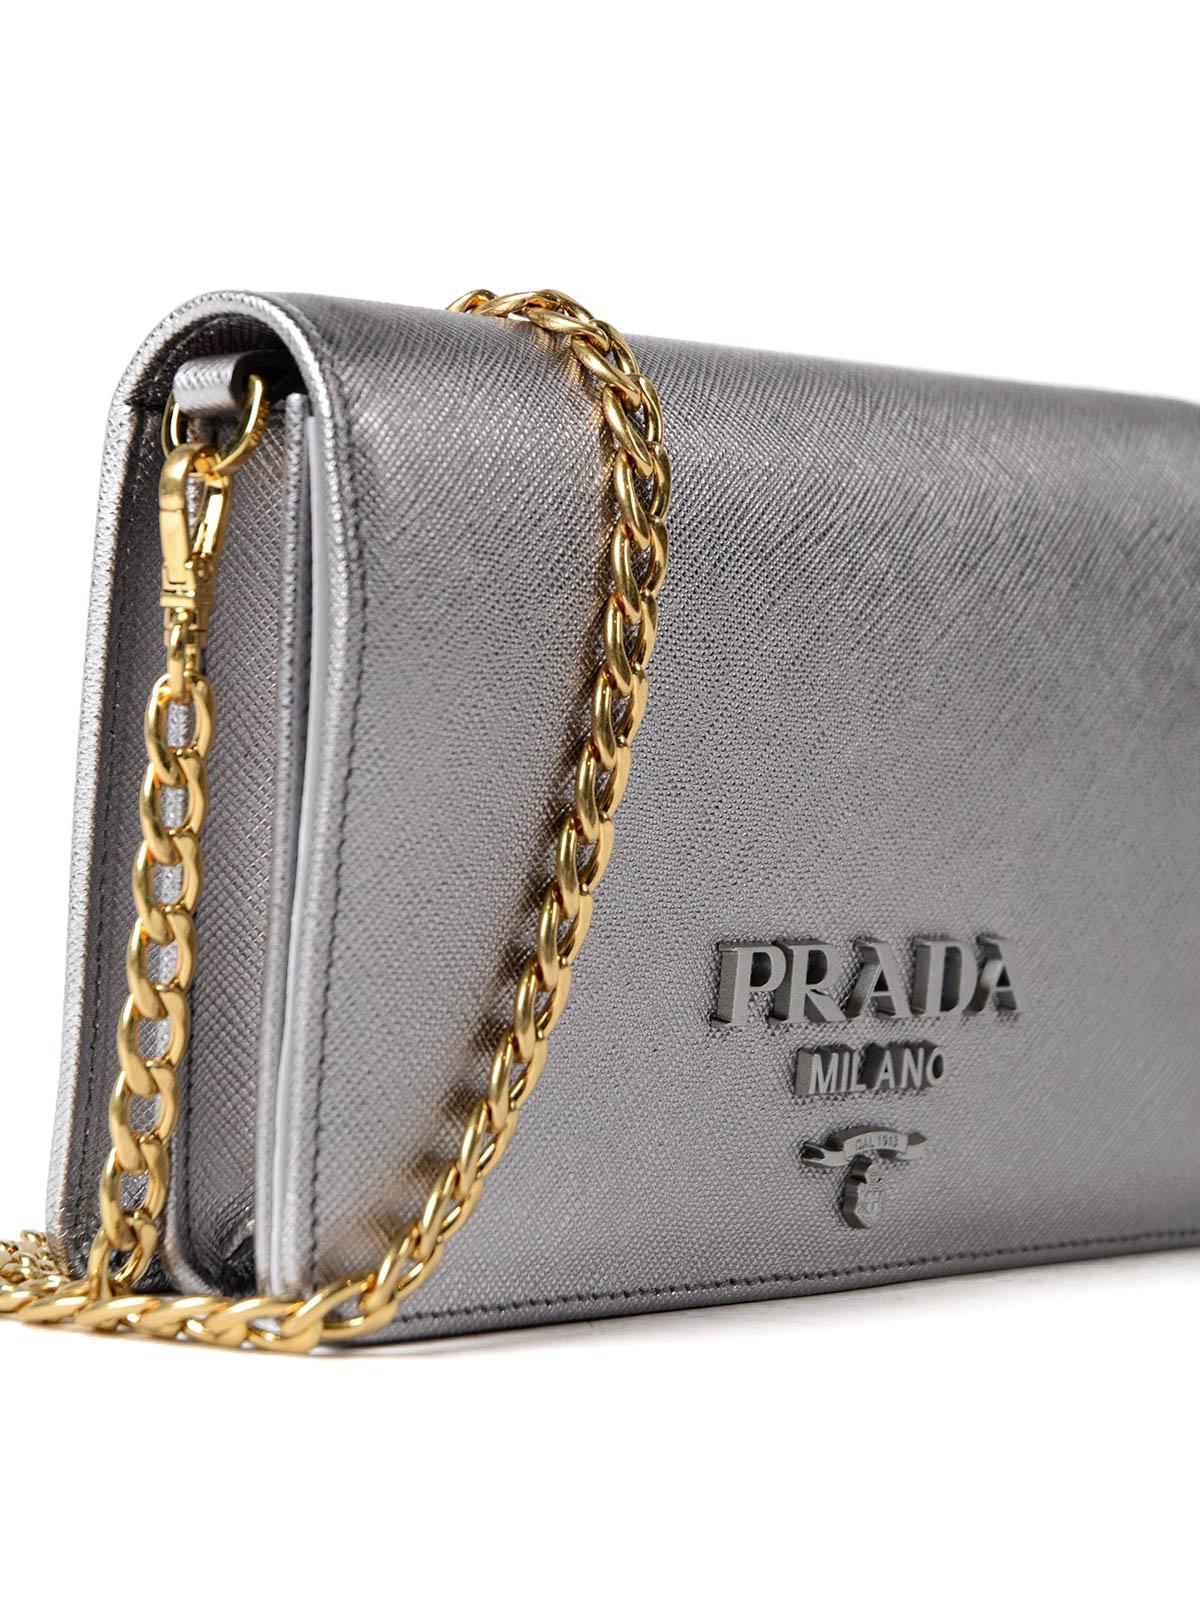 0085043a6d5f Prada Monochrome Silver Wallet Bag Clutches 1bp012nzvvkwo135